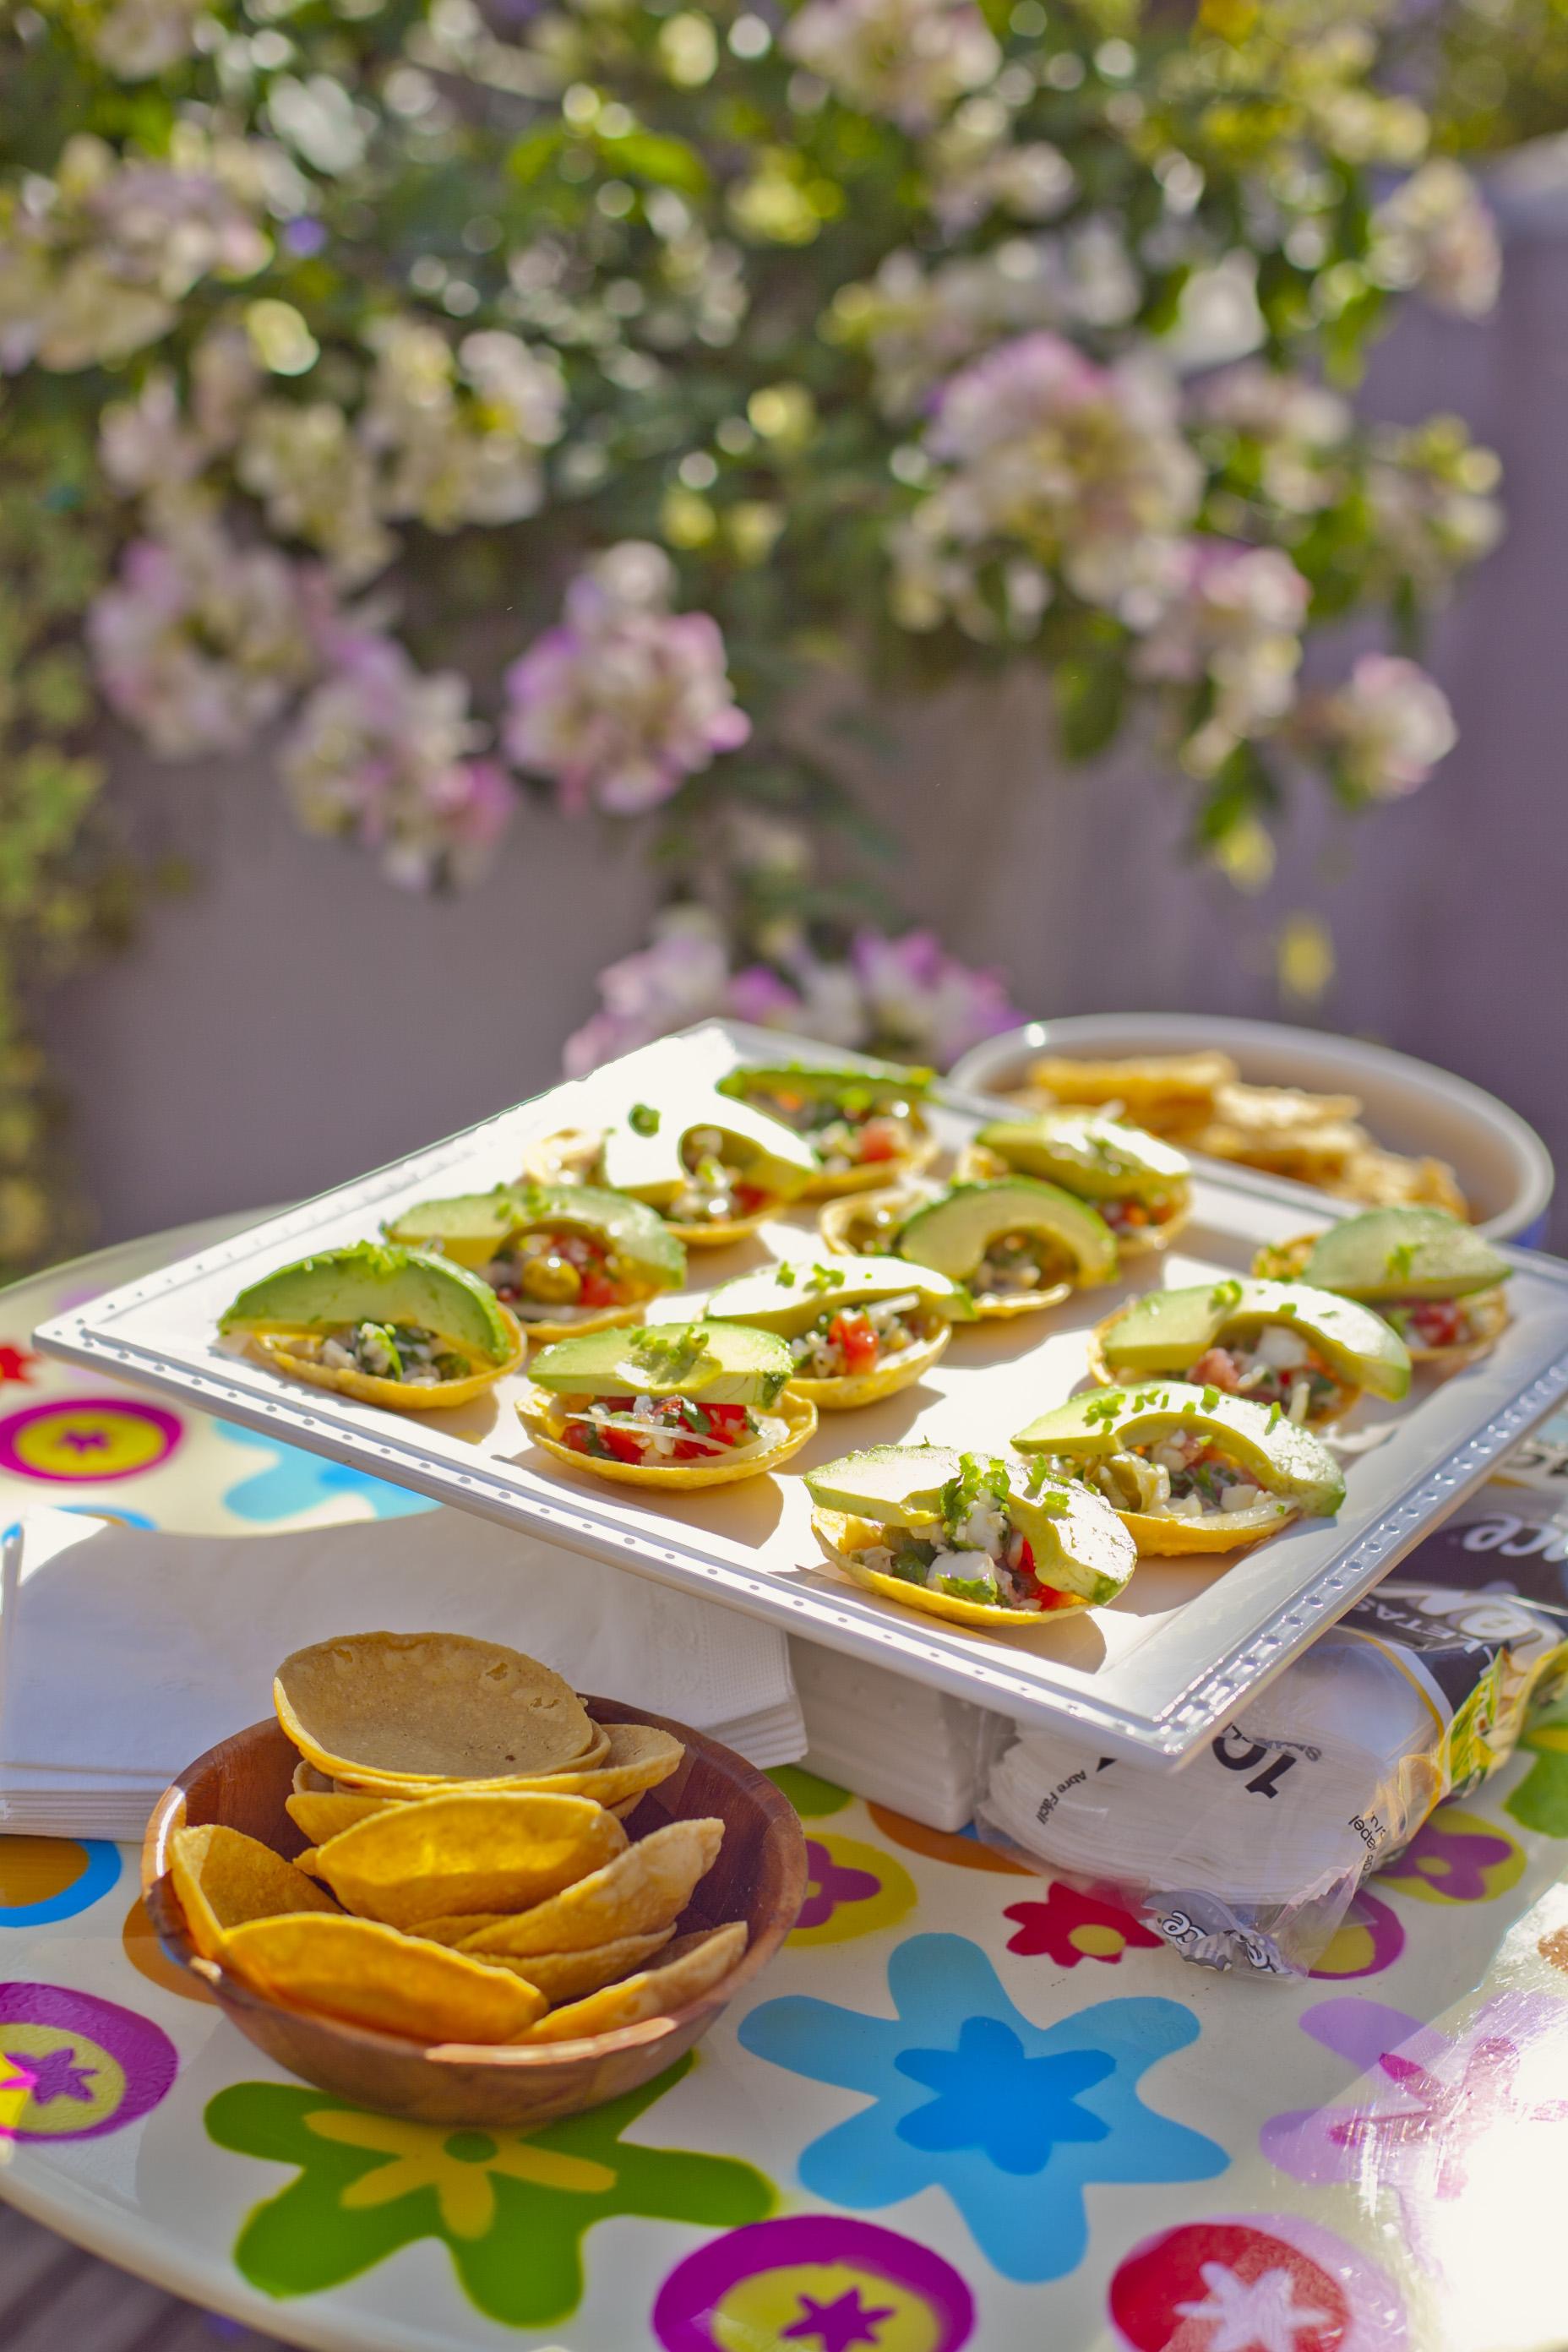 Copy of platter of Ceviche Tostadas